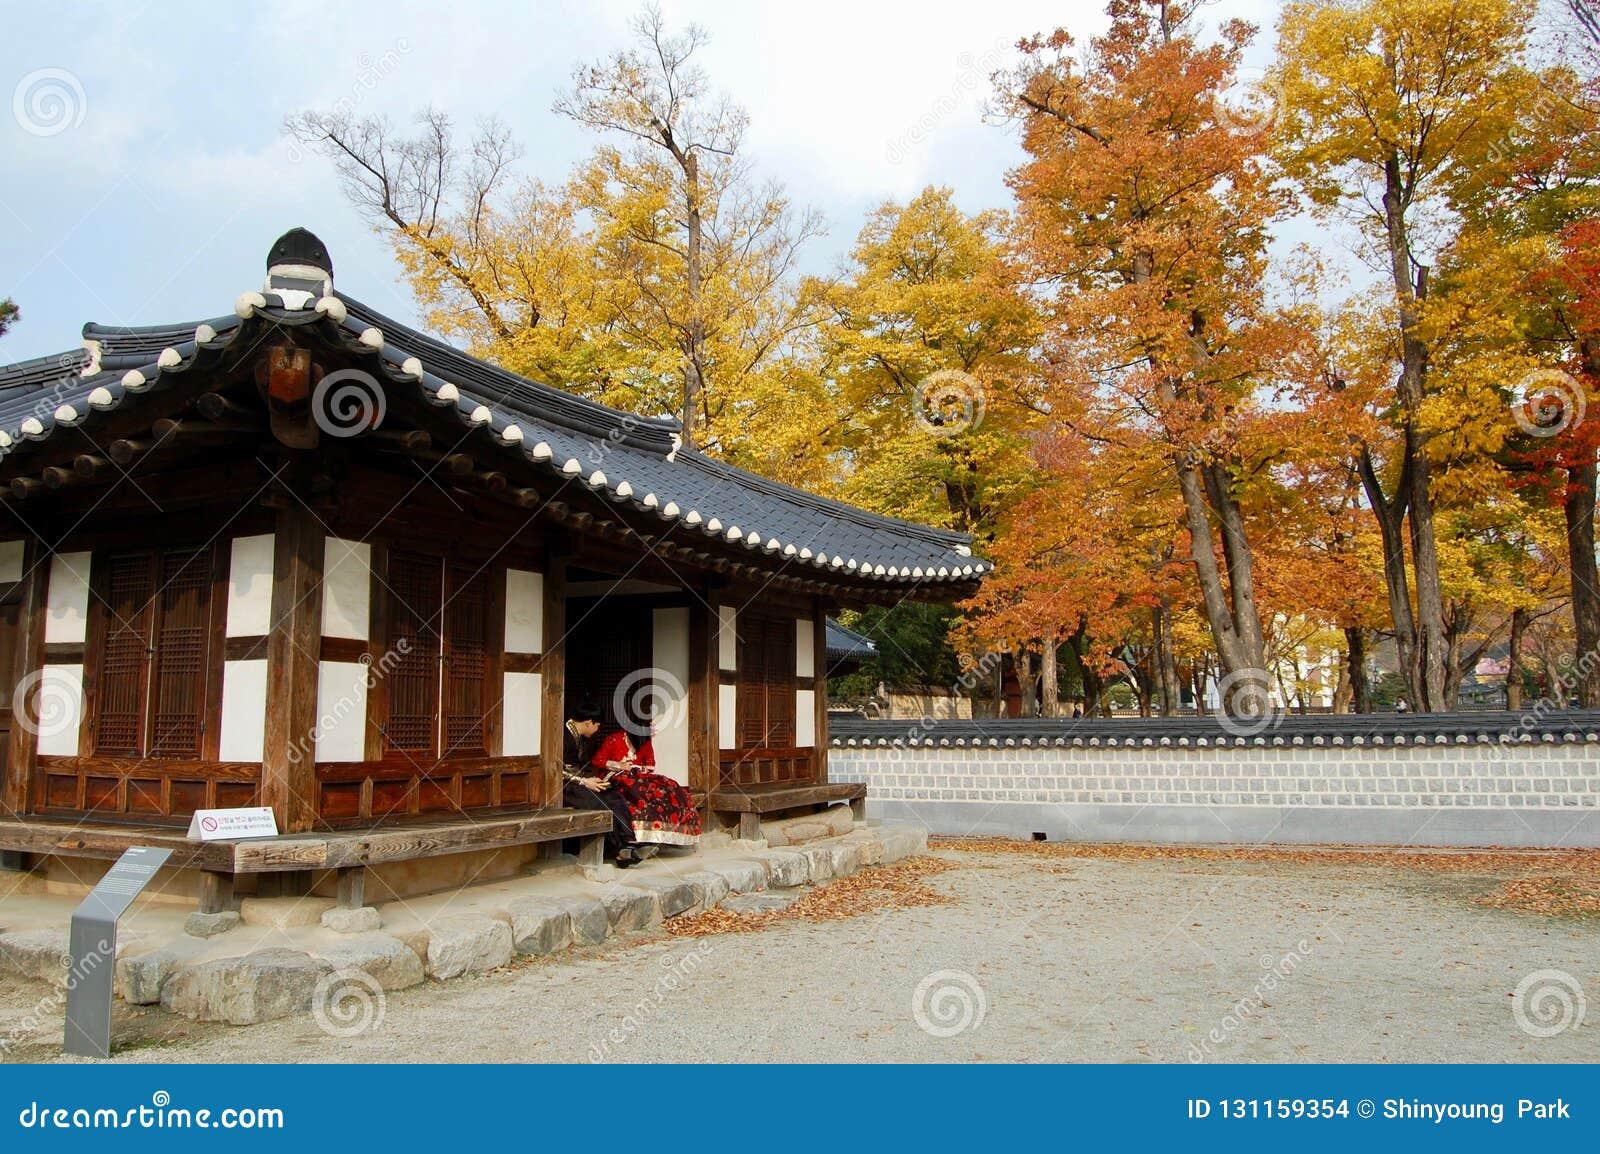 Jeonju Hanok Village, South Korea - 09.11.2018: a couple in hanbok dress inside of traditional palace.